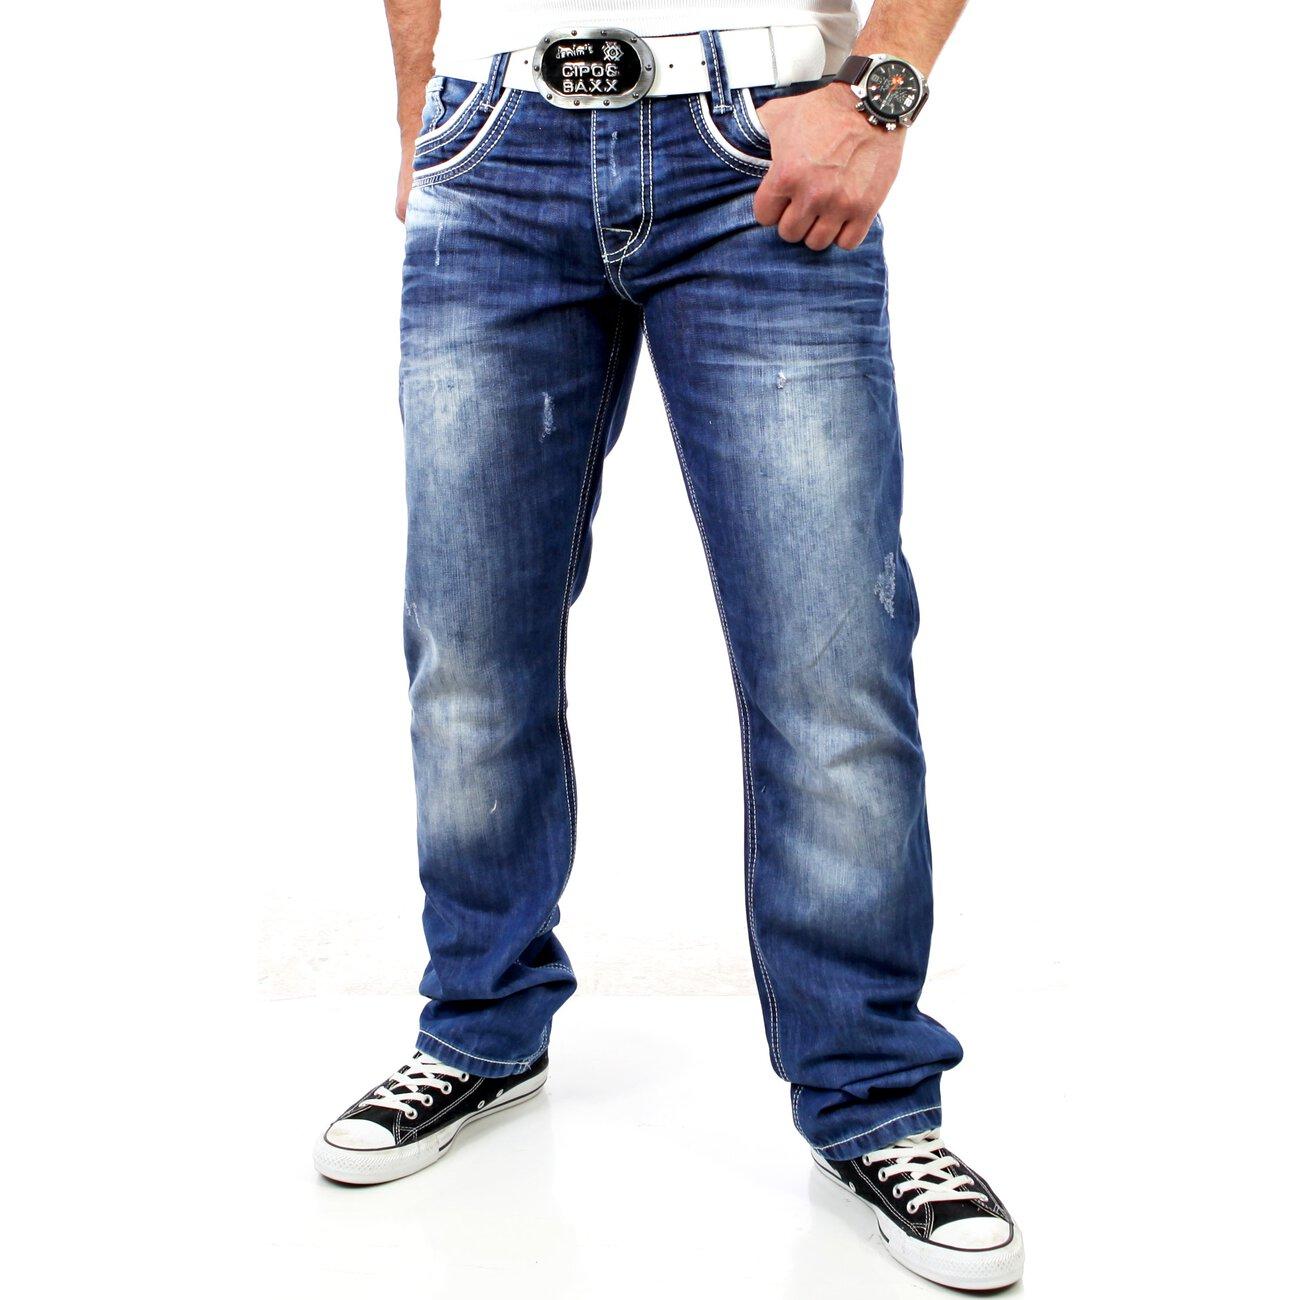 used look jeans herren cipo baxx blau c 1127 kaufen. Black Bedroom Furniture Sets. Home Design Ideas